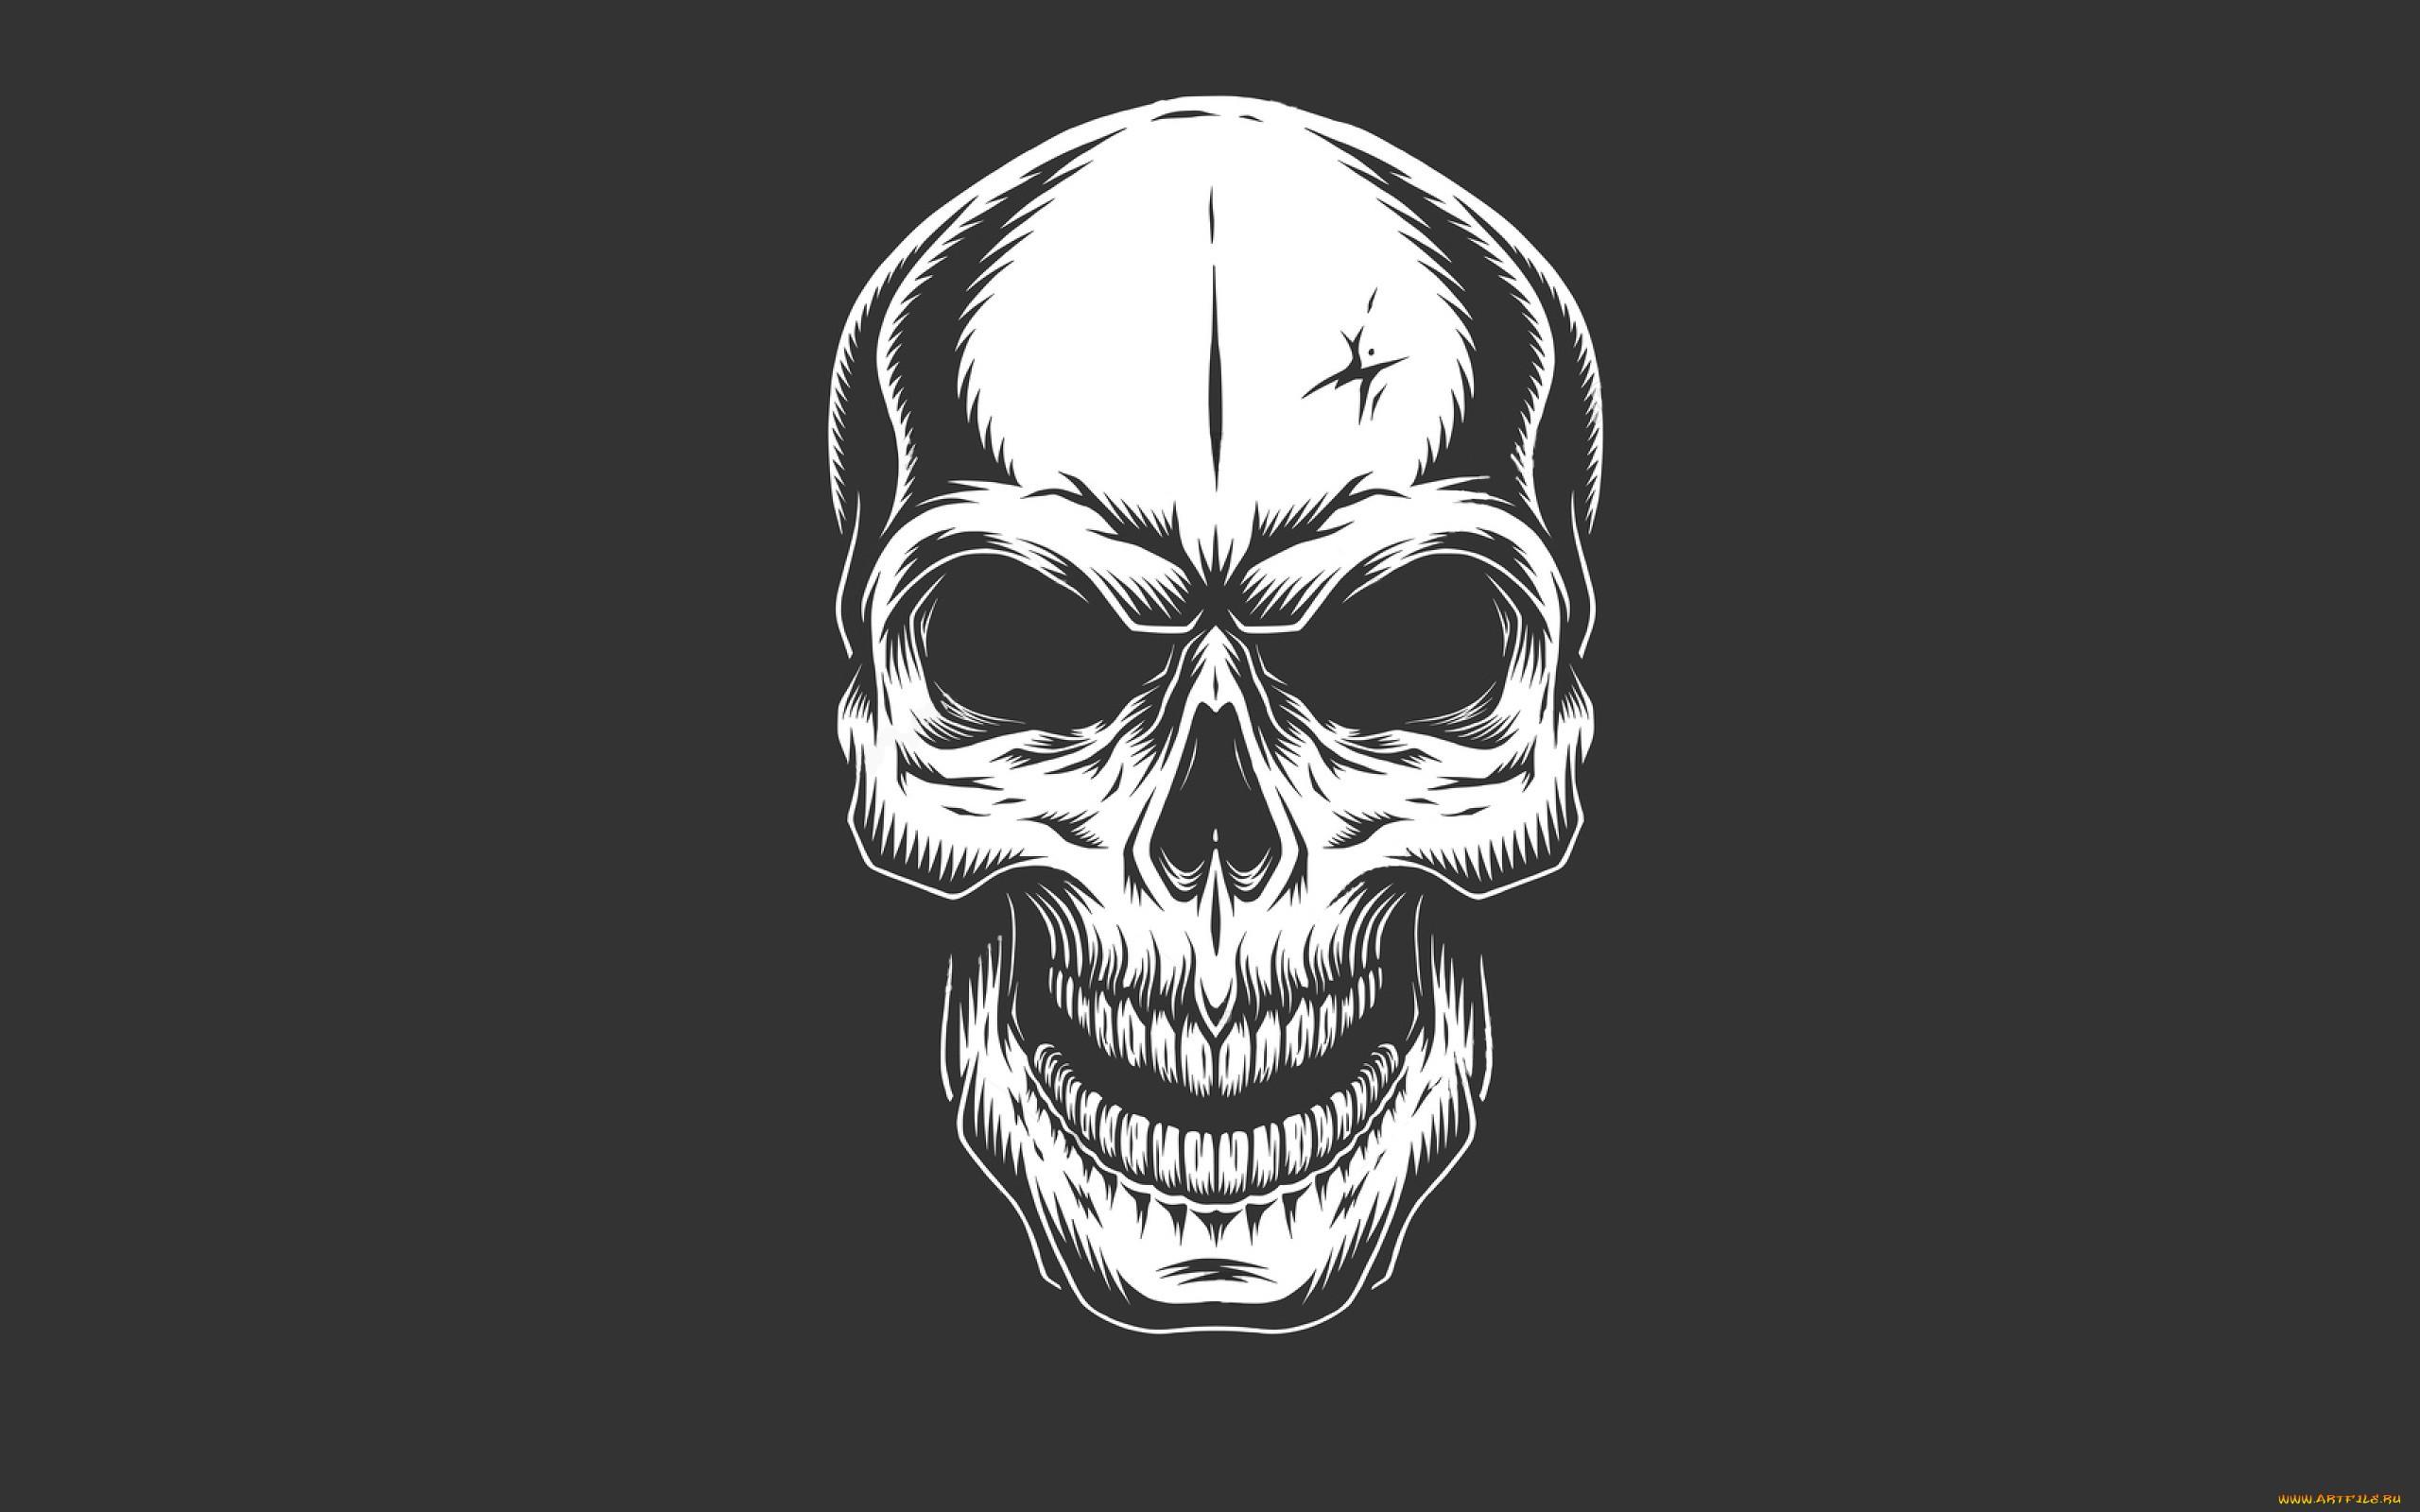 Wallpaper Skull Minimalism Simple Background